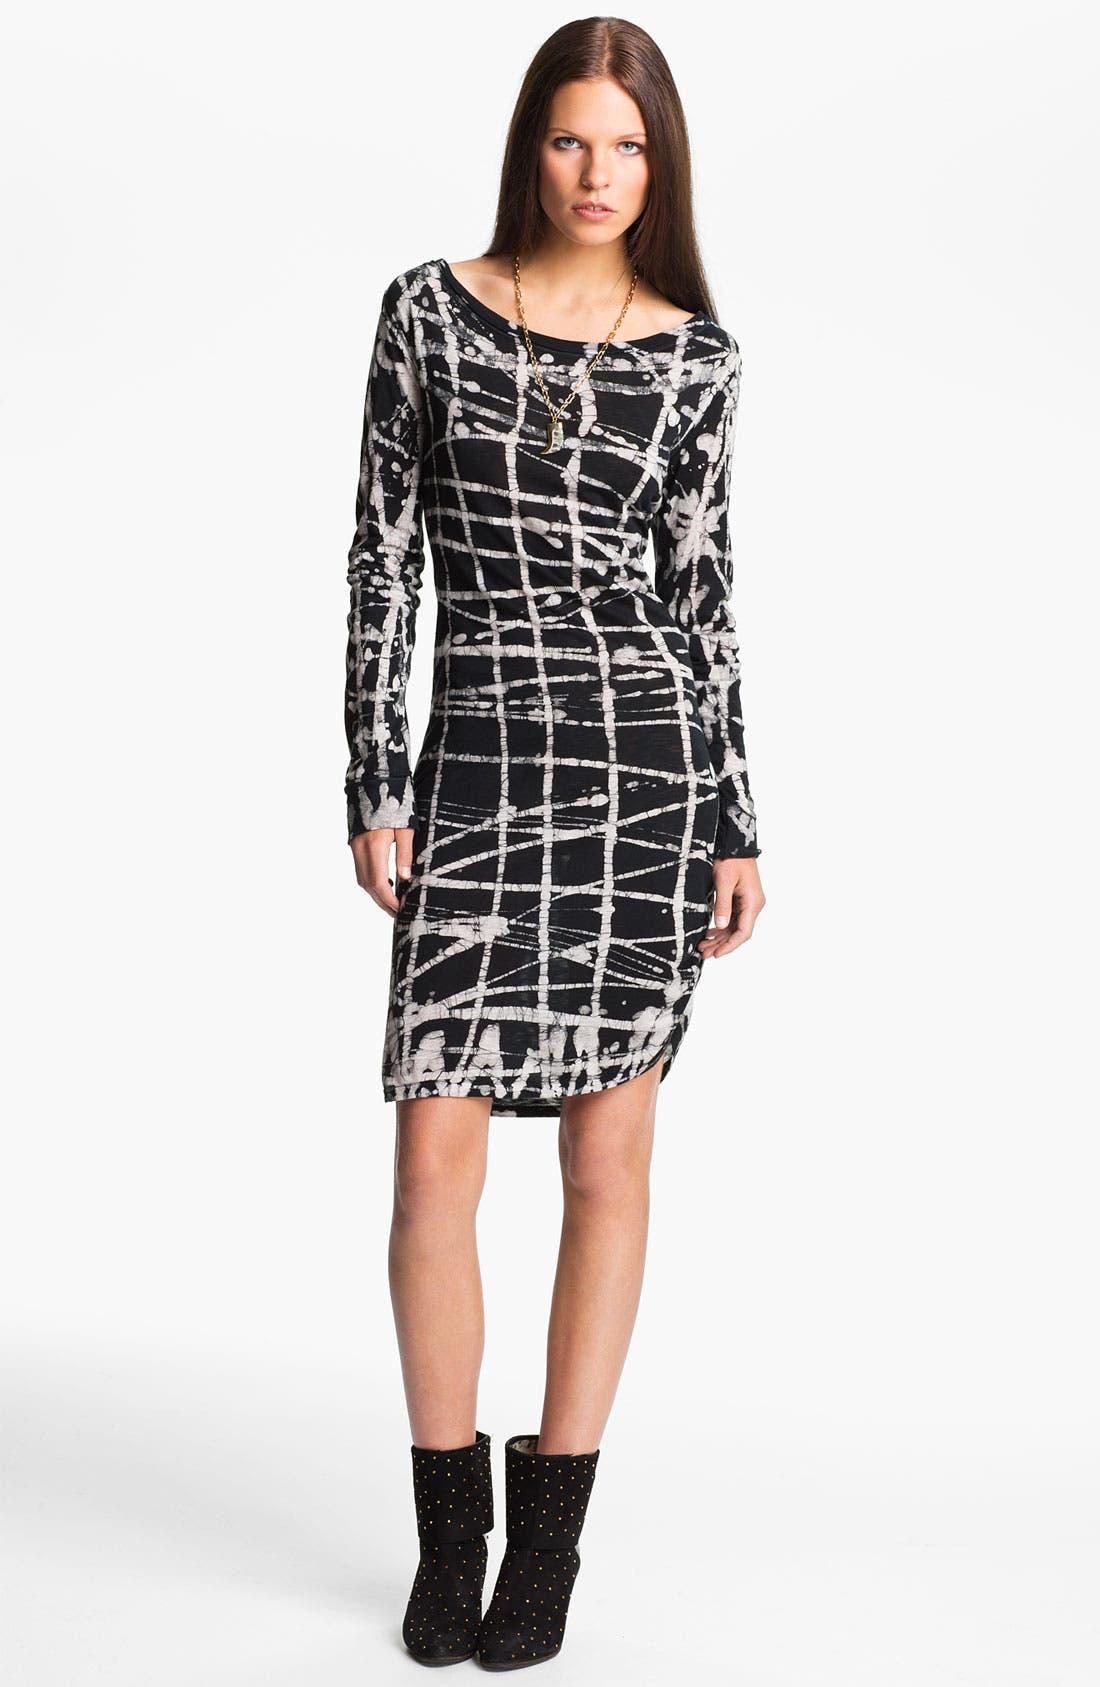 Alternate Image 1 Selected - Kelly Wearstler 'Batik Cage' Jersey Dress